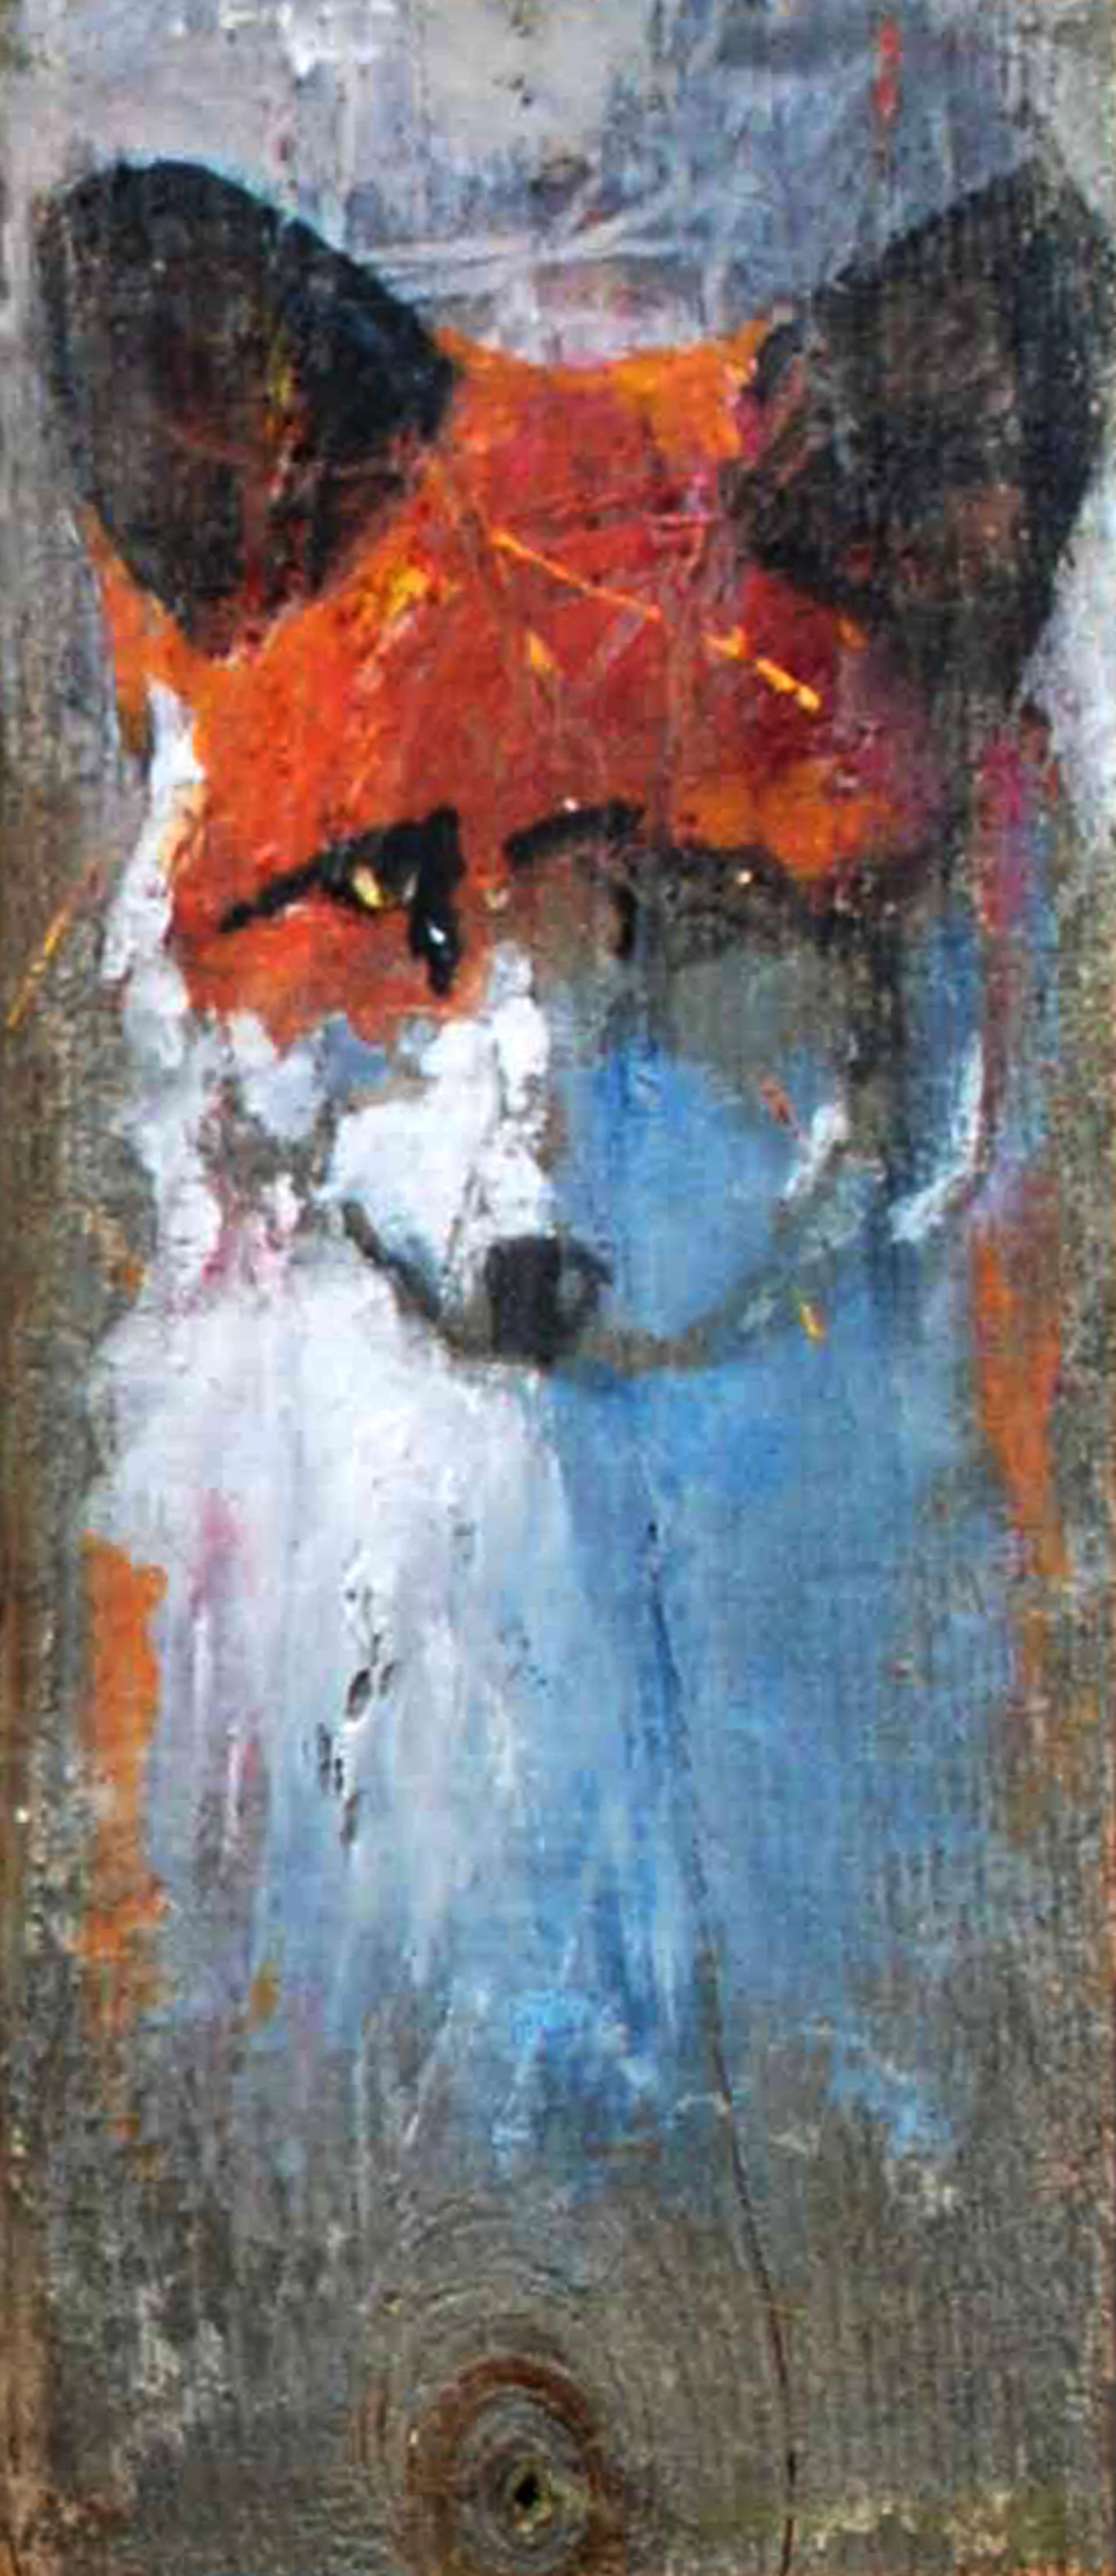 Fox #3 by Susan Easton Burns